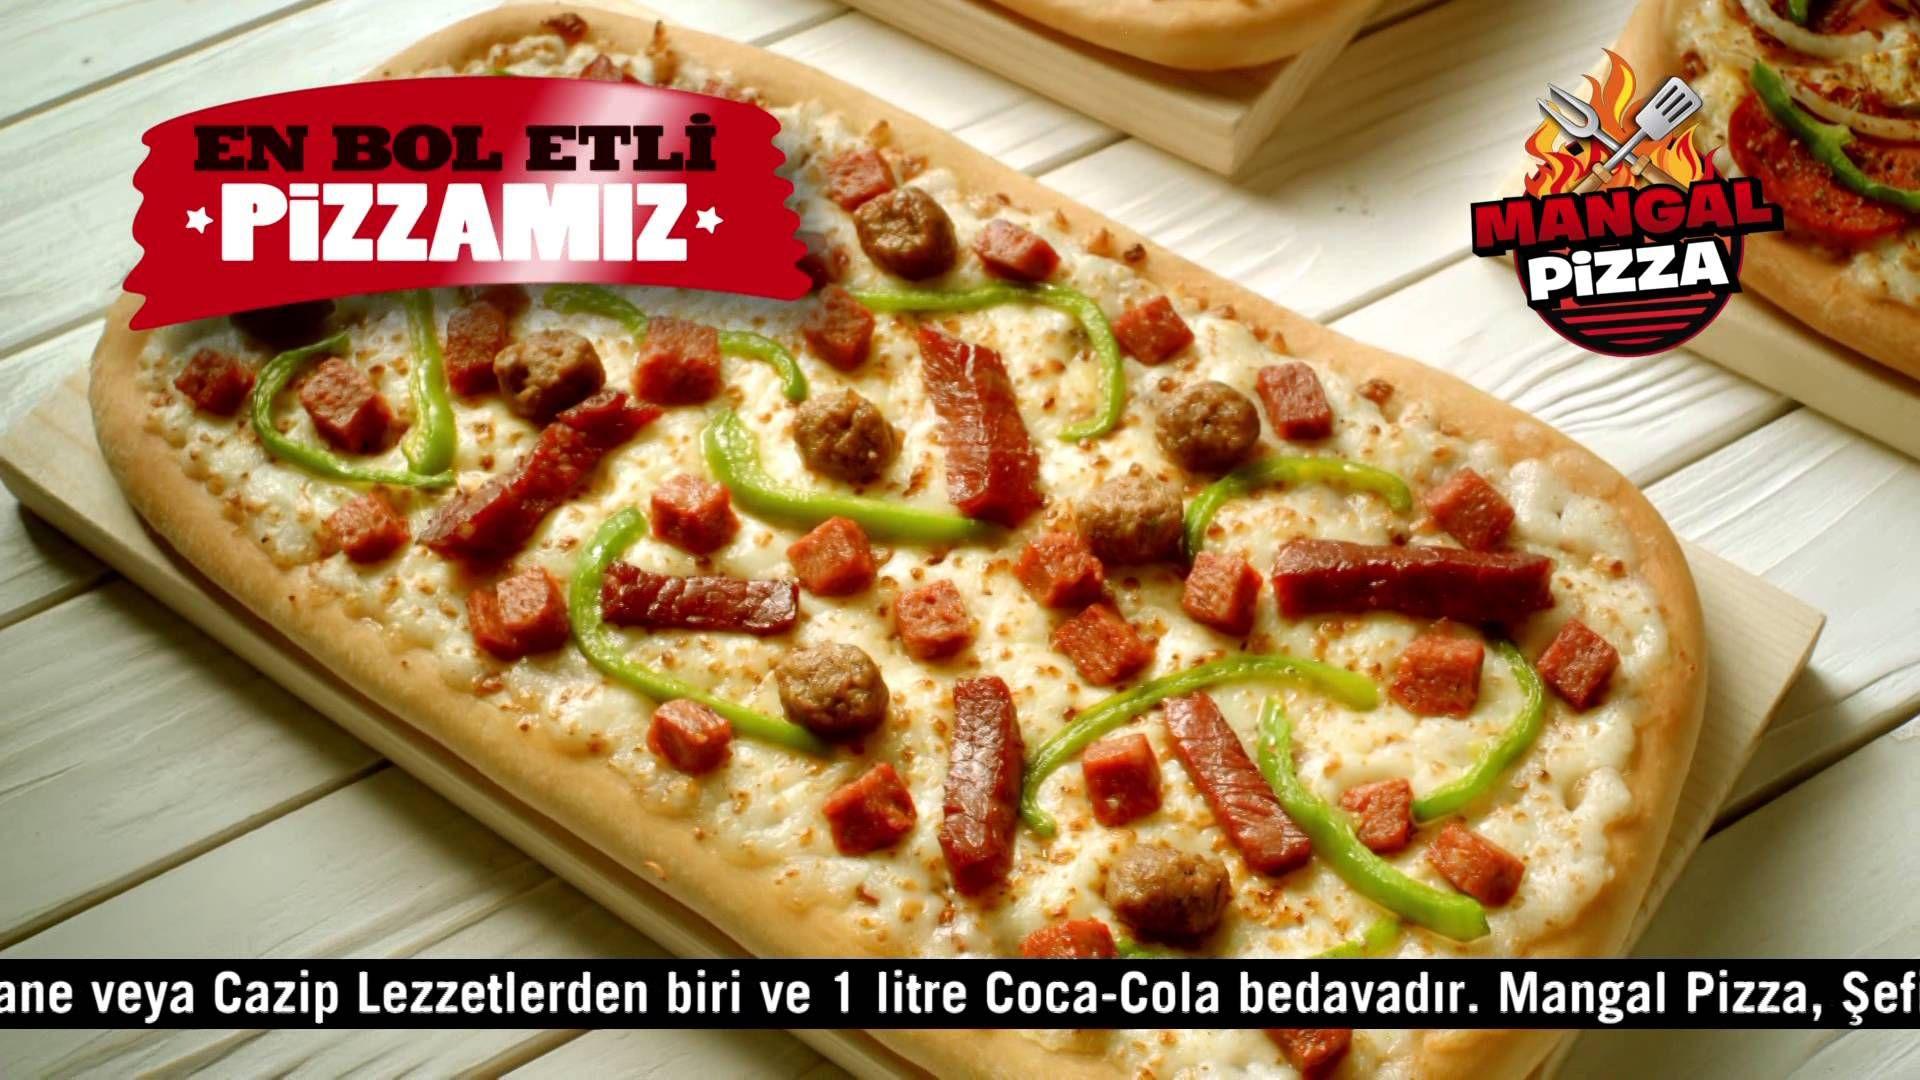 Mevlana Dominos Pizza